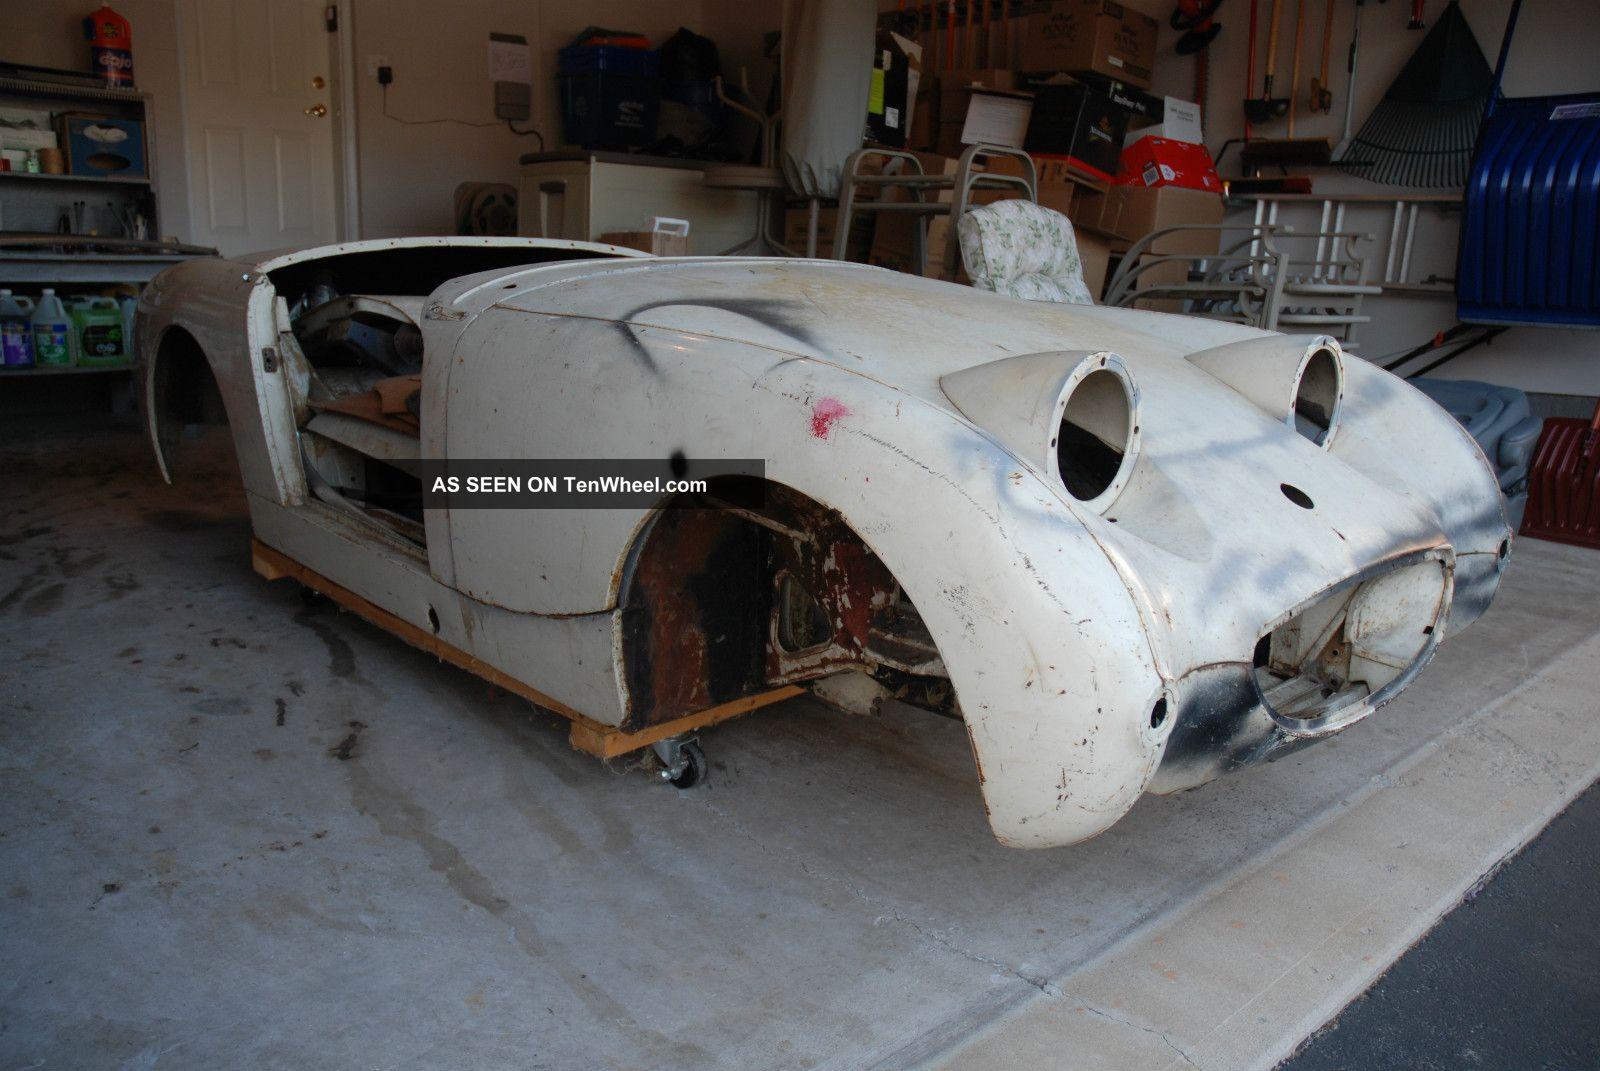 1959 Austin - Healey Bugeye Sprite - Rust California Project Car Austin Healey photo